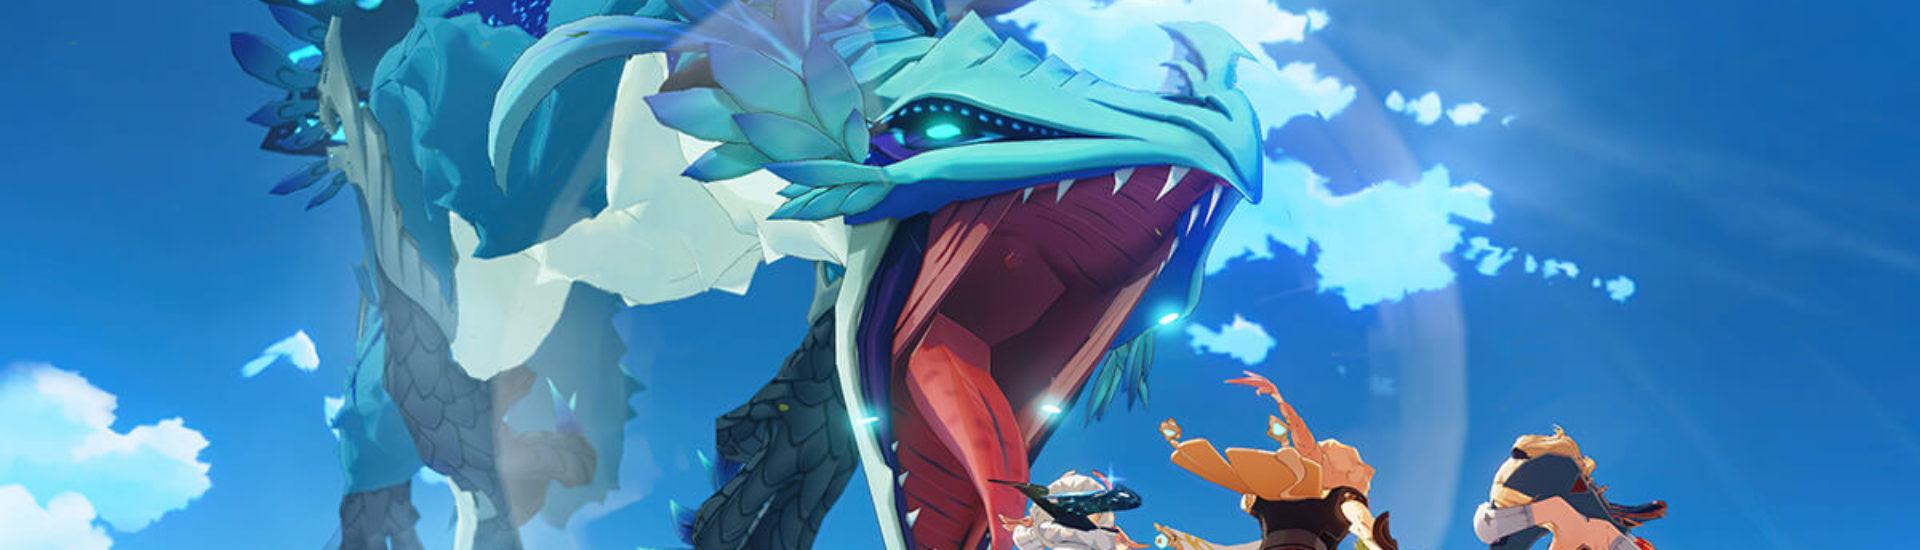 Genshin Impact: Neuer Open-World-Hit oder doch eher Lootbox-Ärgernis?